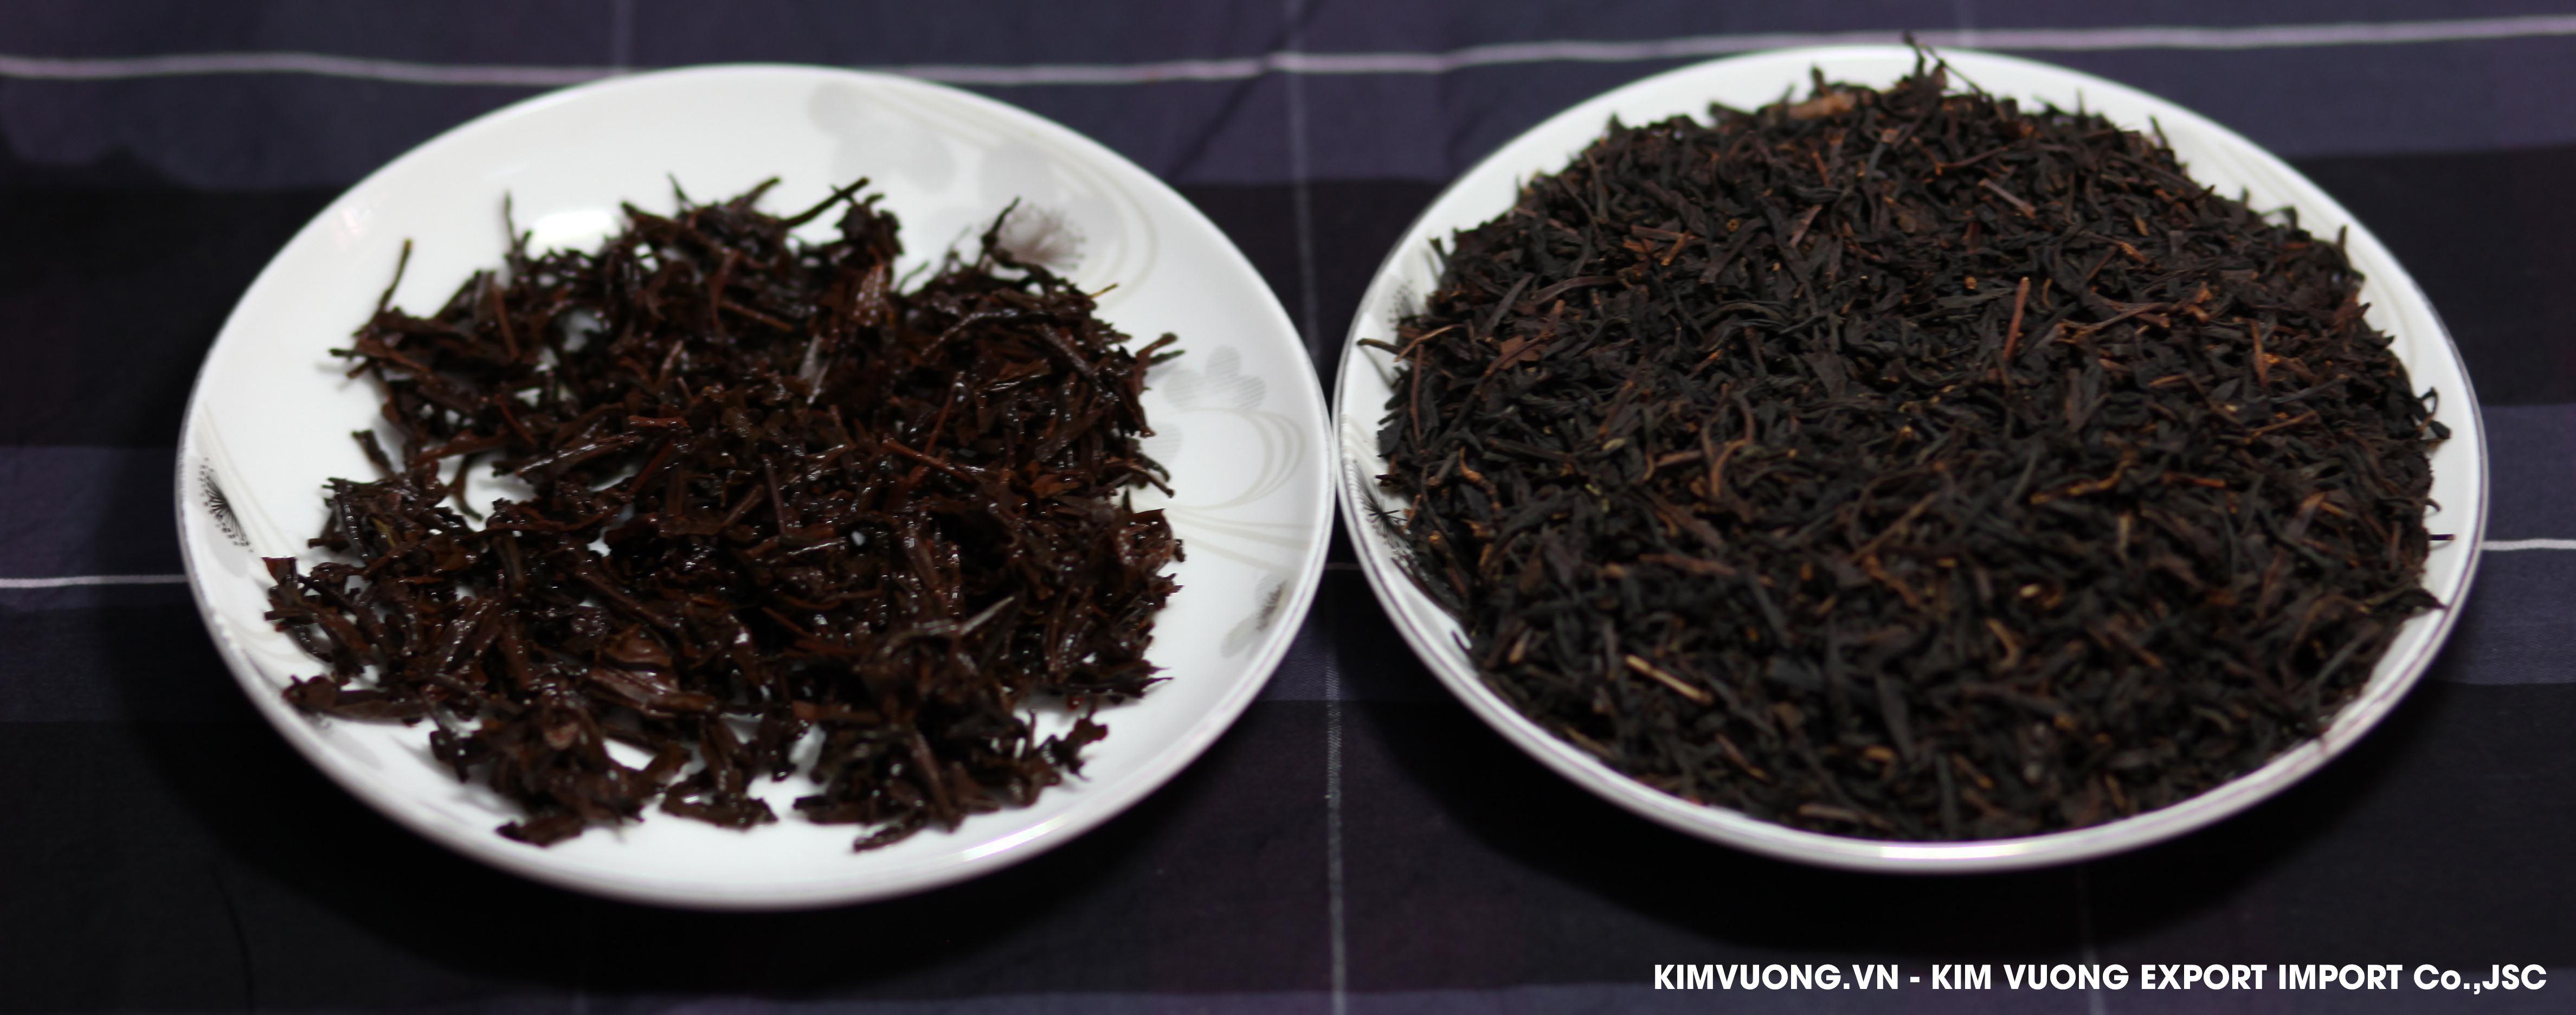 Black tea OP exports - Kim Vuong JSC